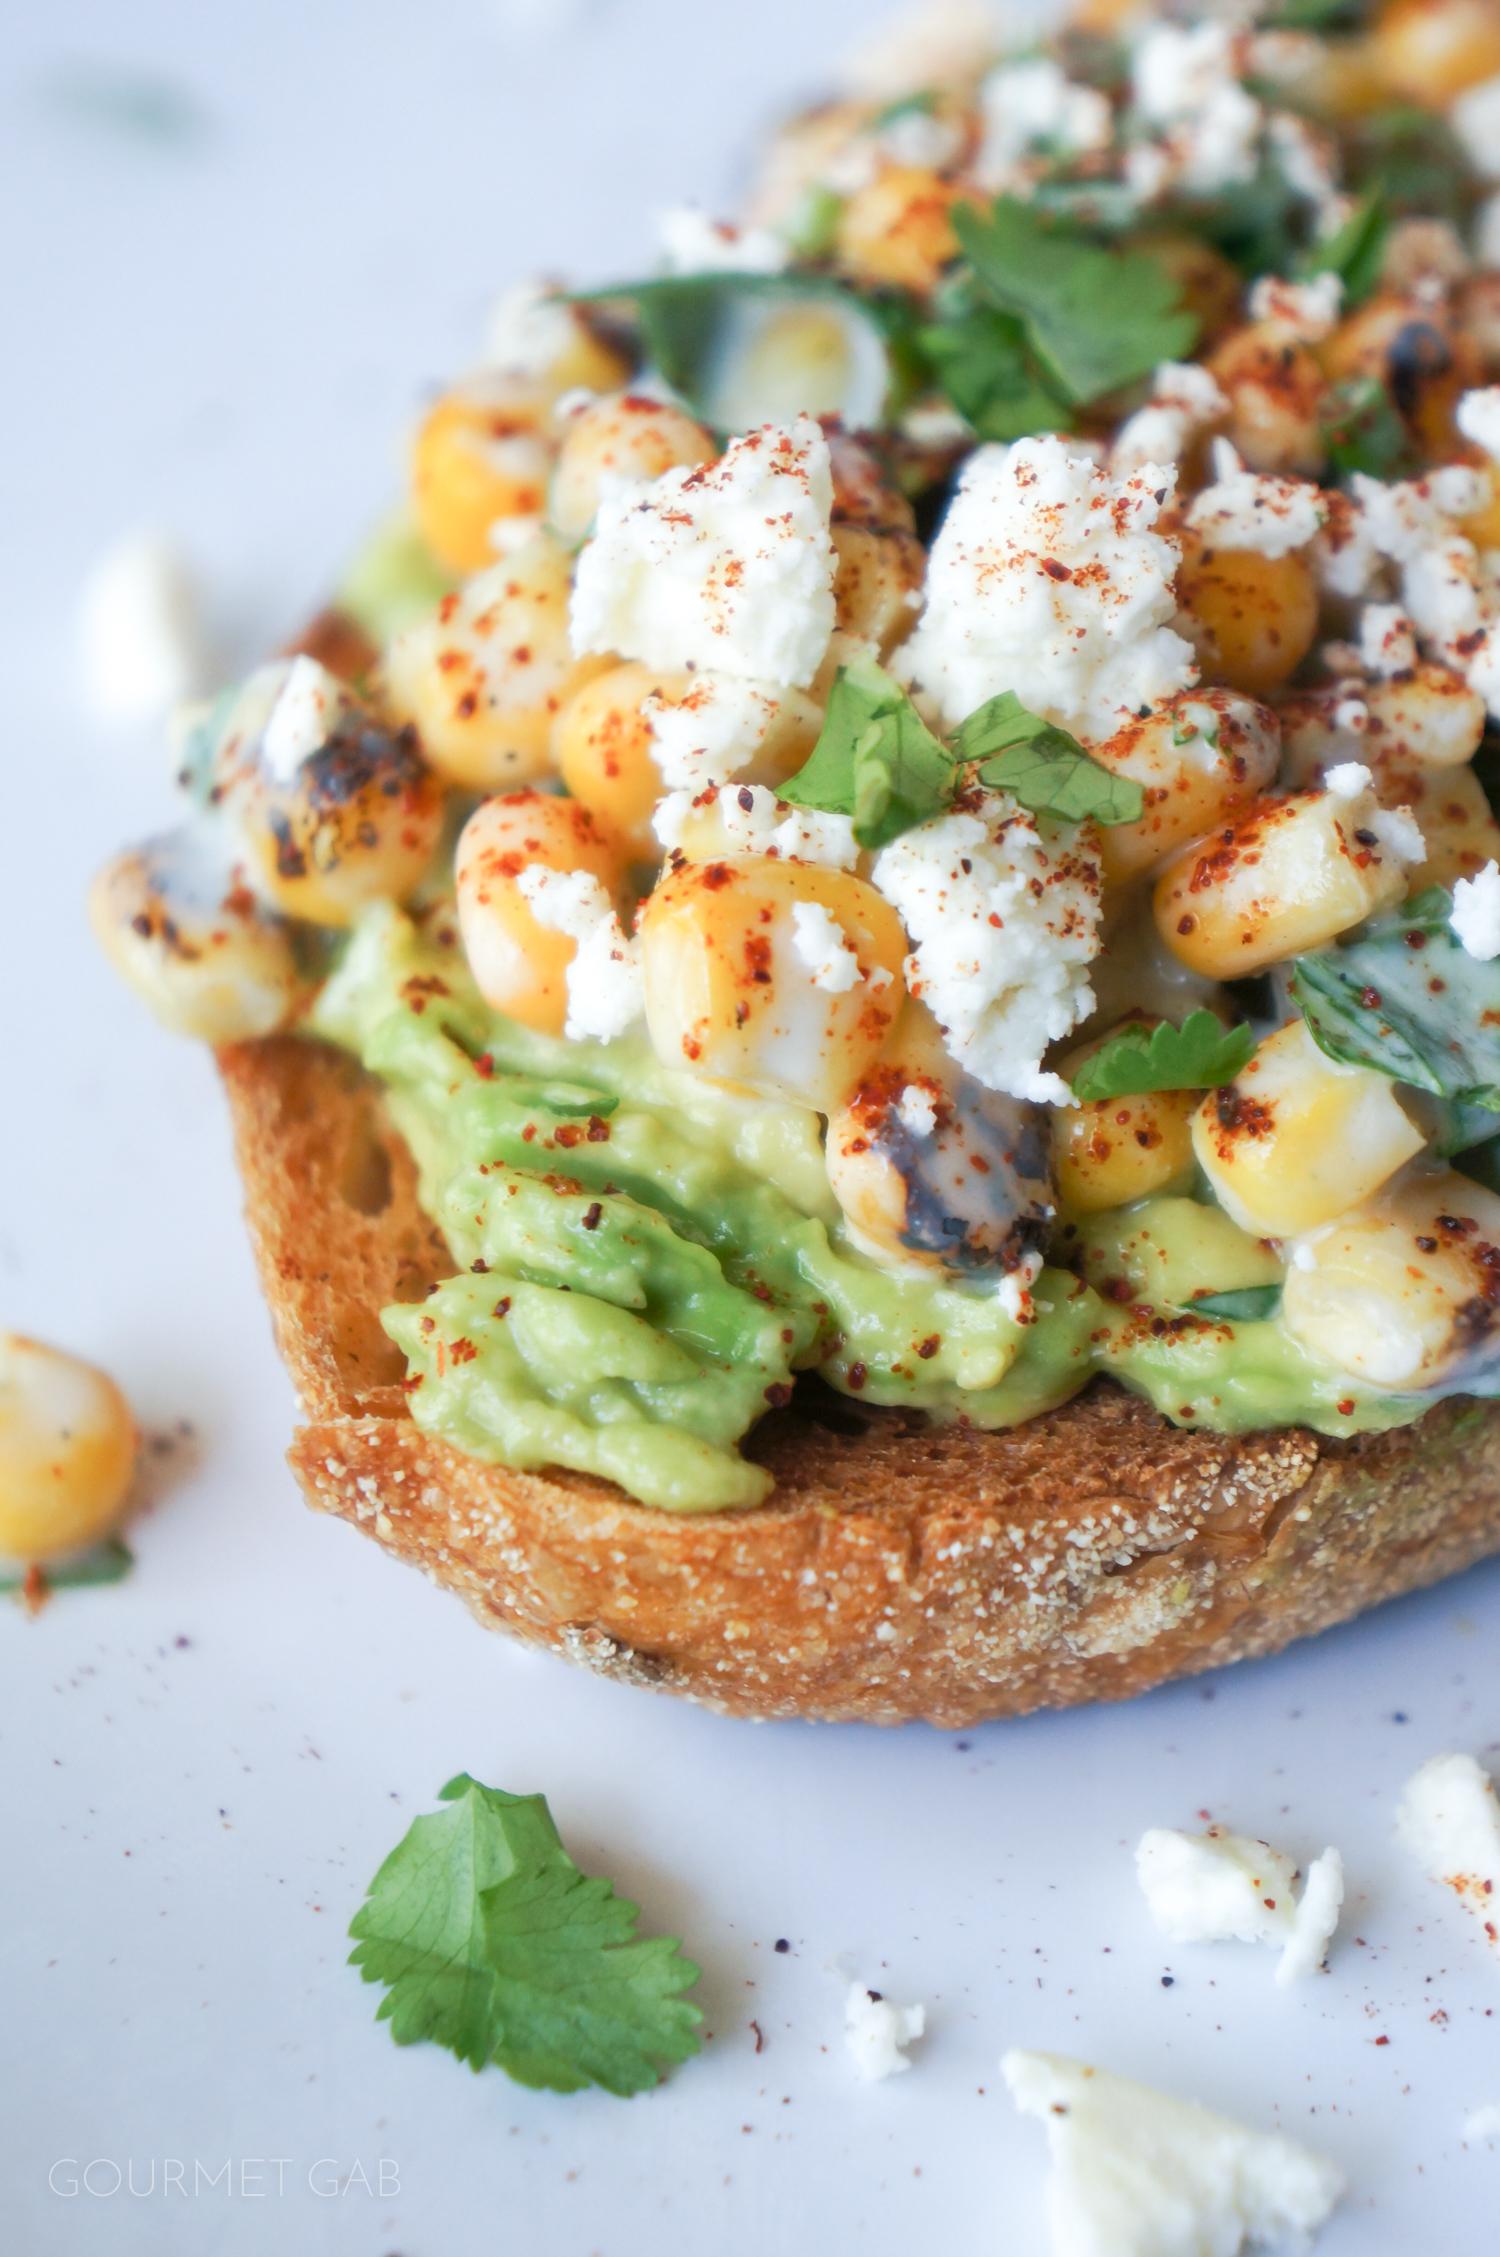 Mexican Street Corn-Inspired Avocado Toast